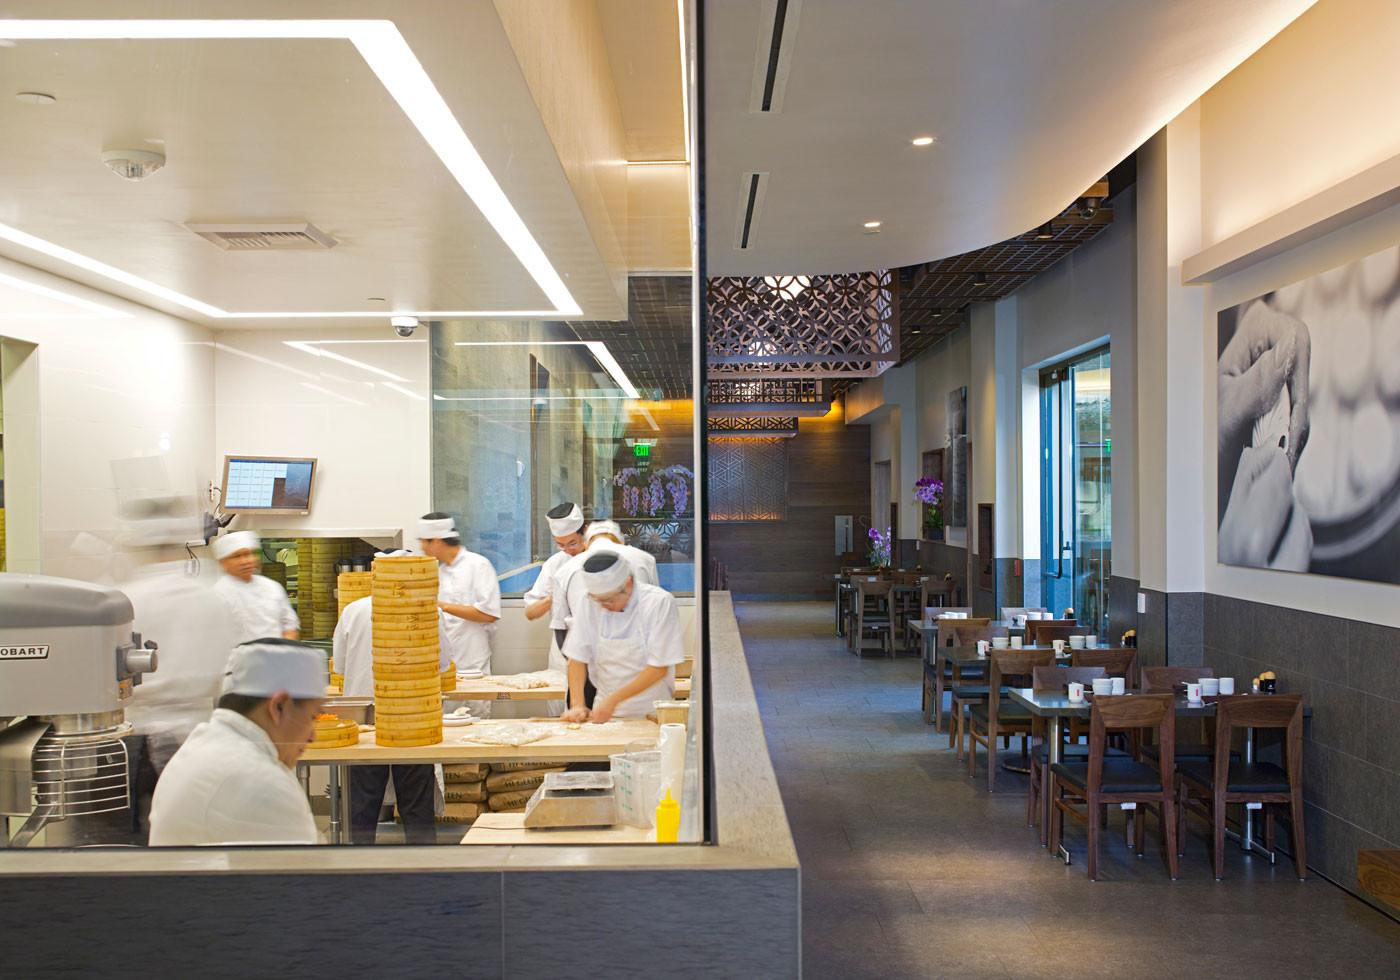 Poon design inc for Kitchen remodel yuba city ca